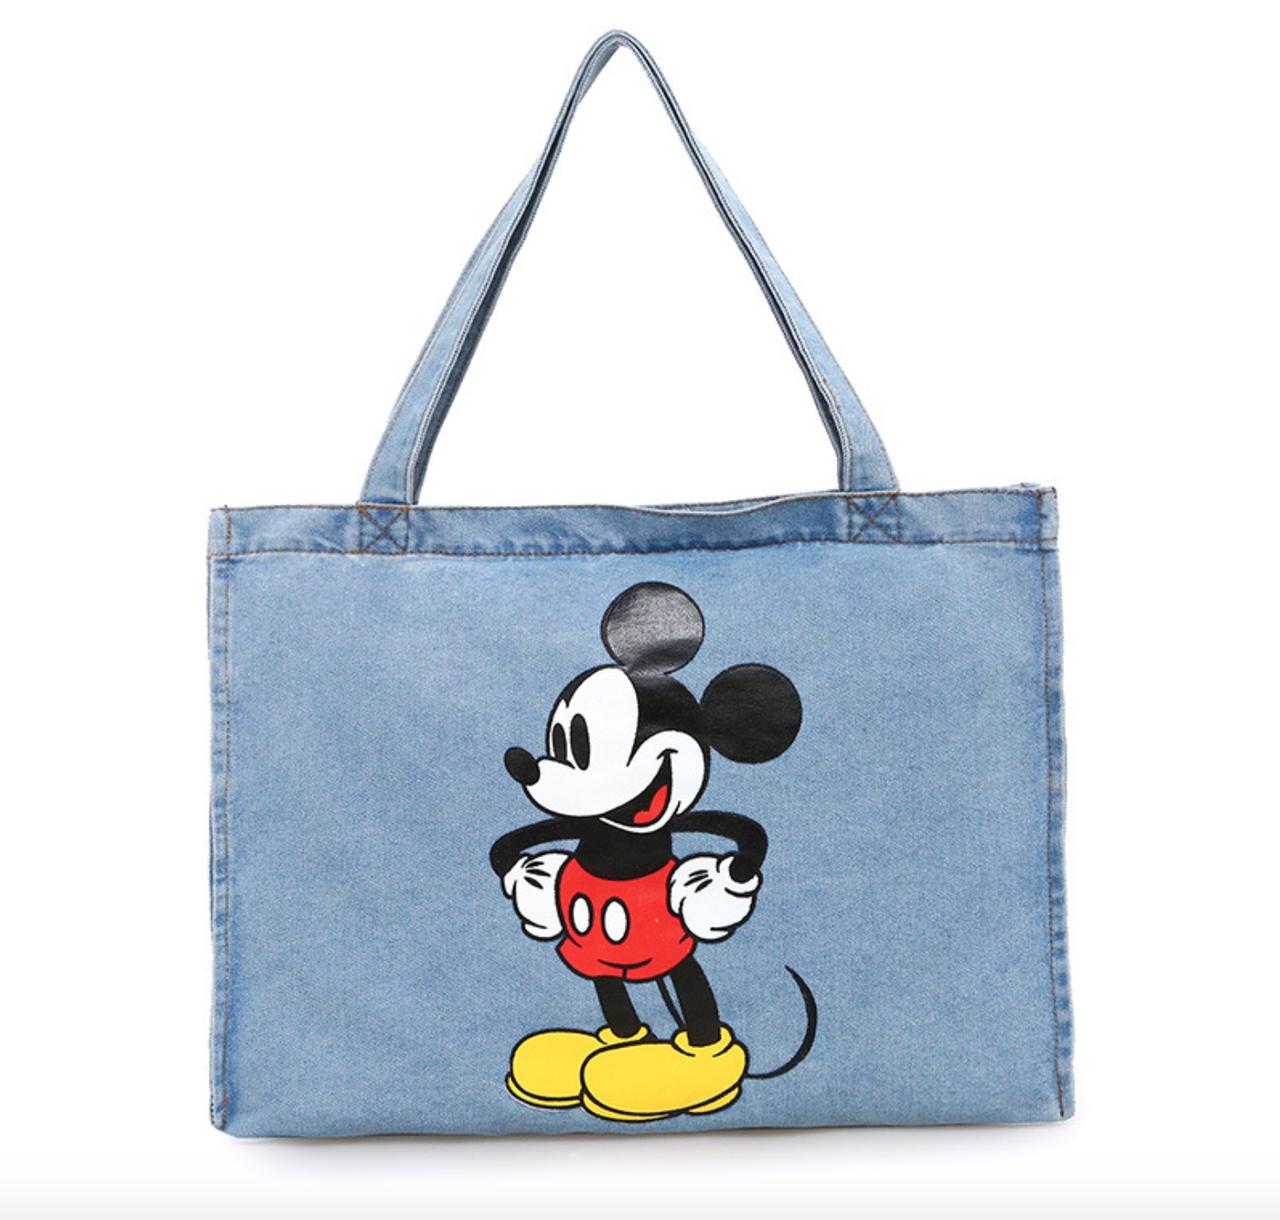 Тканевая Эко Сумка Шоппер City-A Mickey Maus с Микки Маусом Джинс